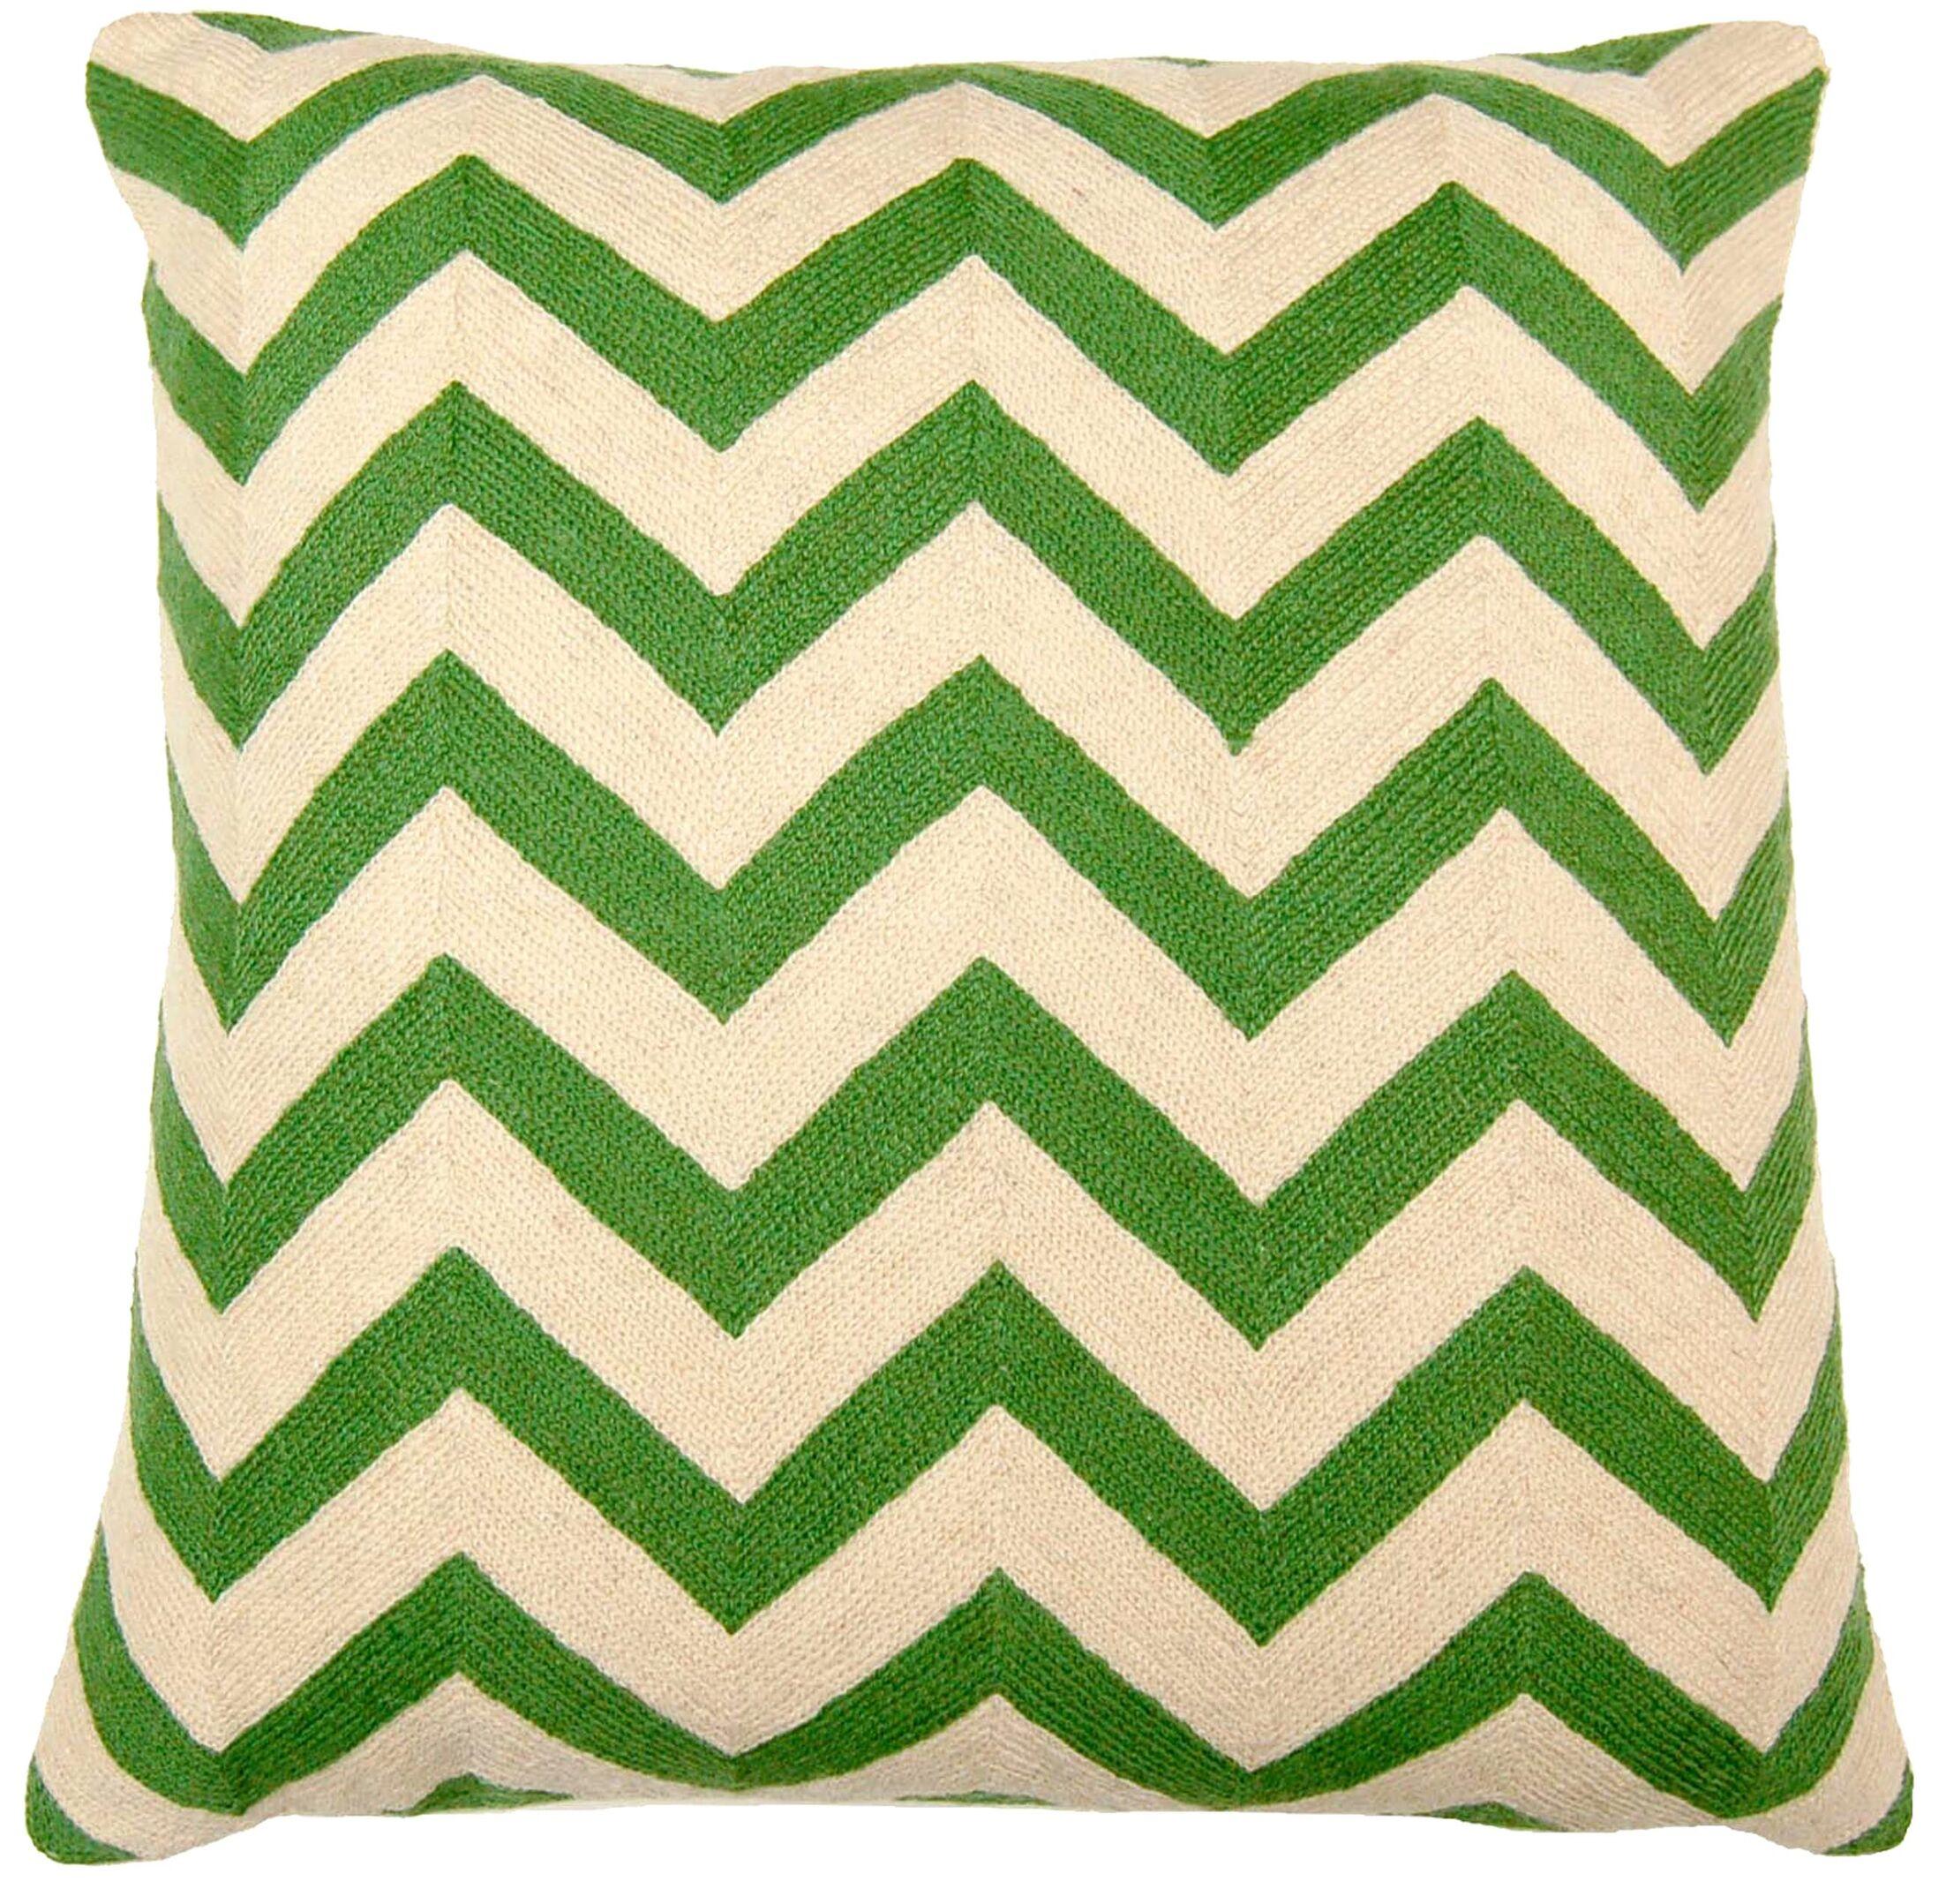 Chevron Hand Embroidery Throw Pillow Color: Green